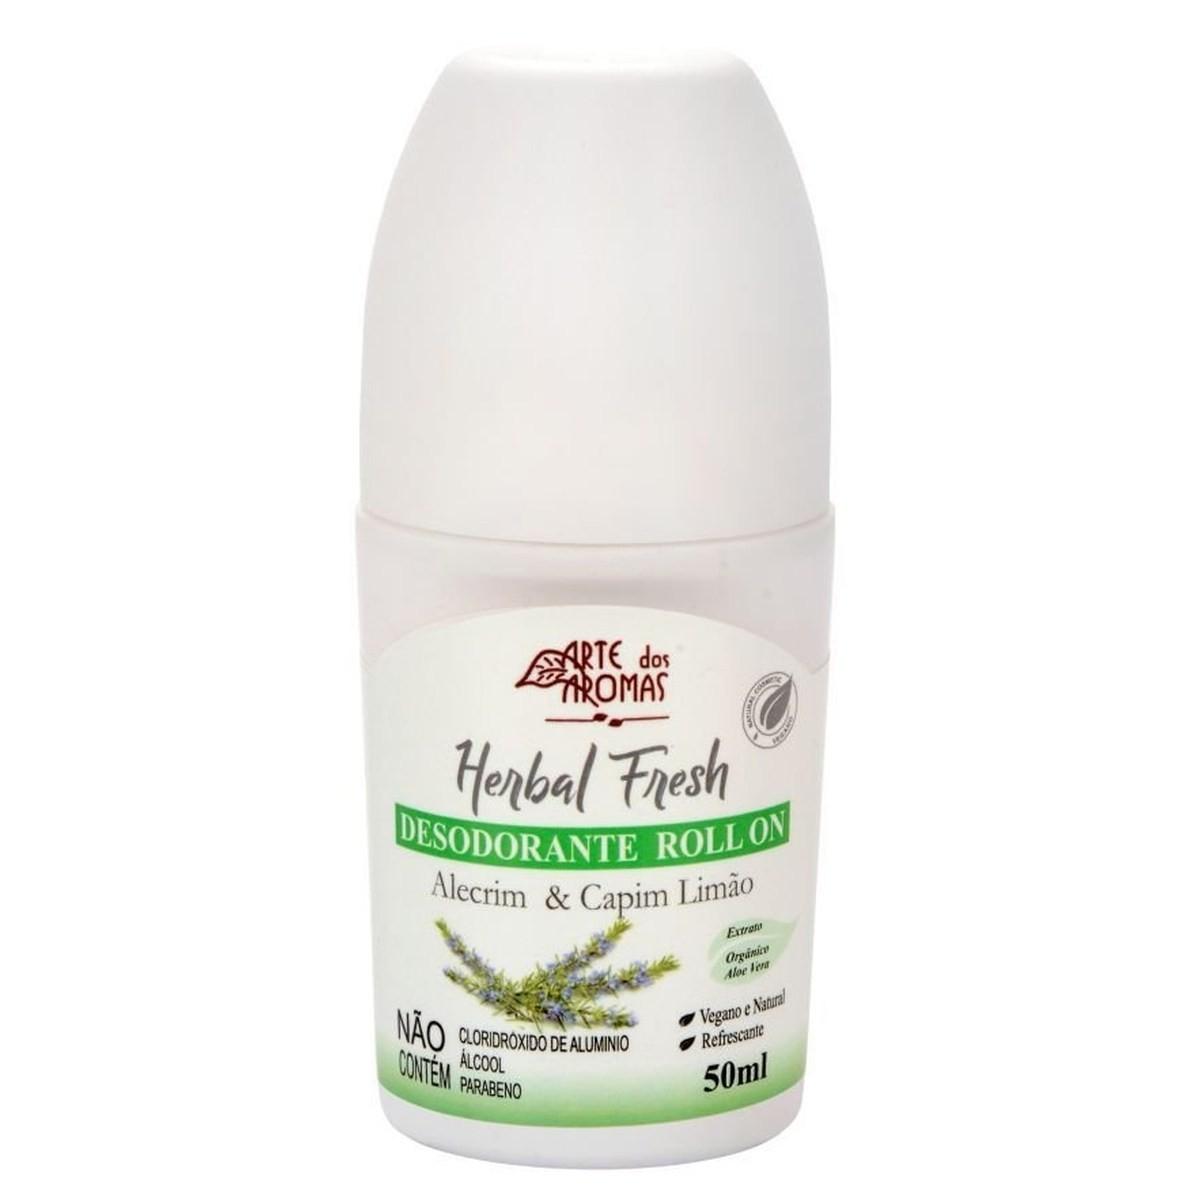 Desodorante Roll on Herbal Fresh Natural e Vegano Arte dos Aromas 50ml